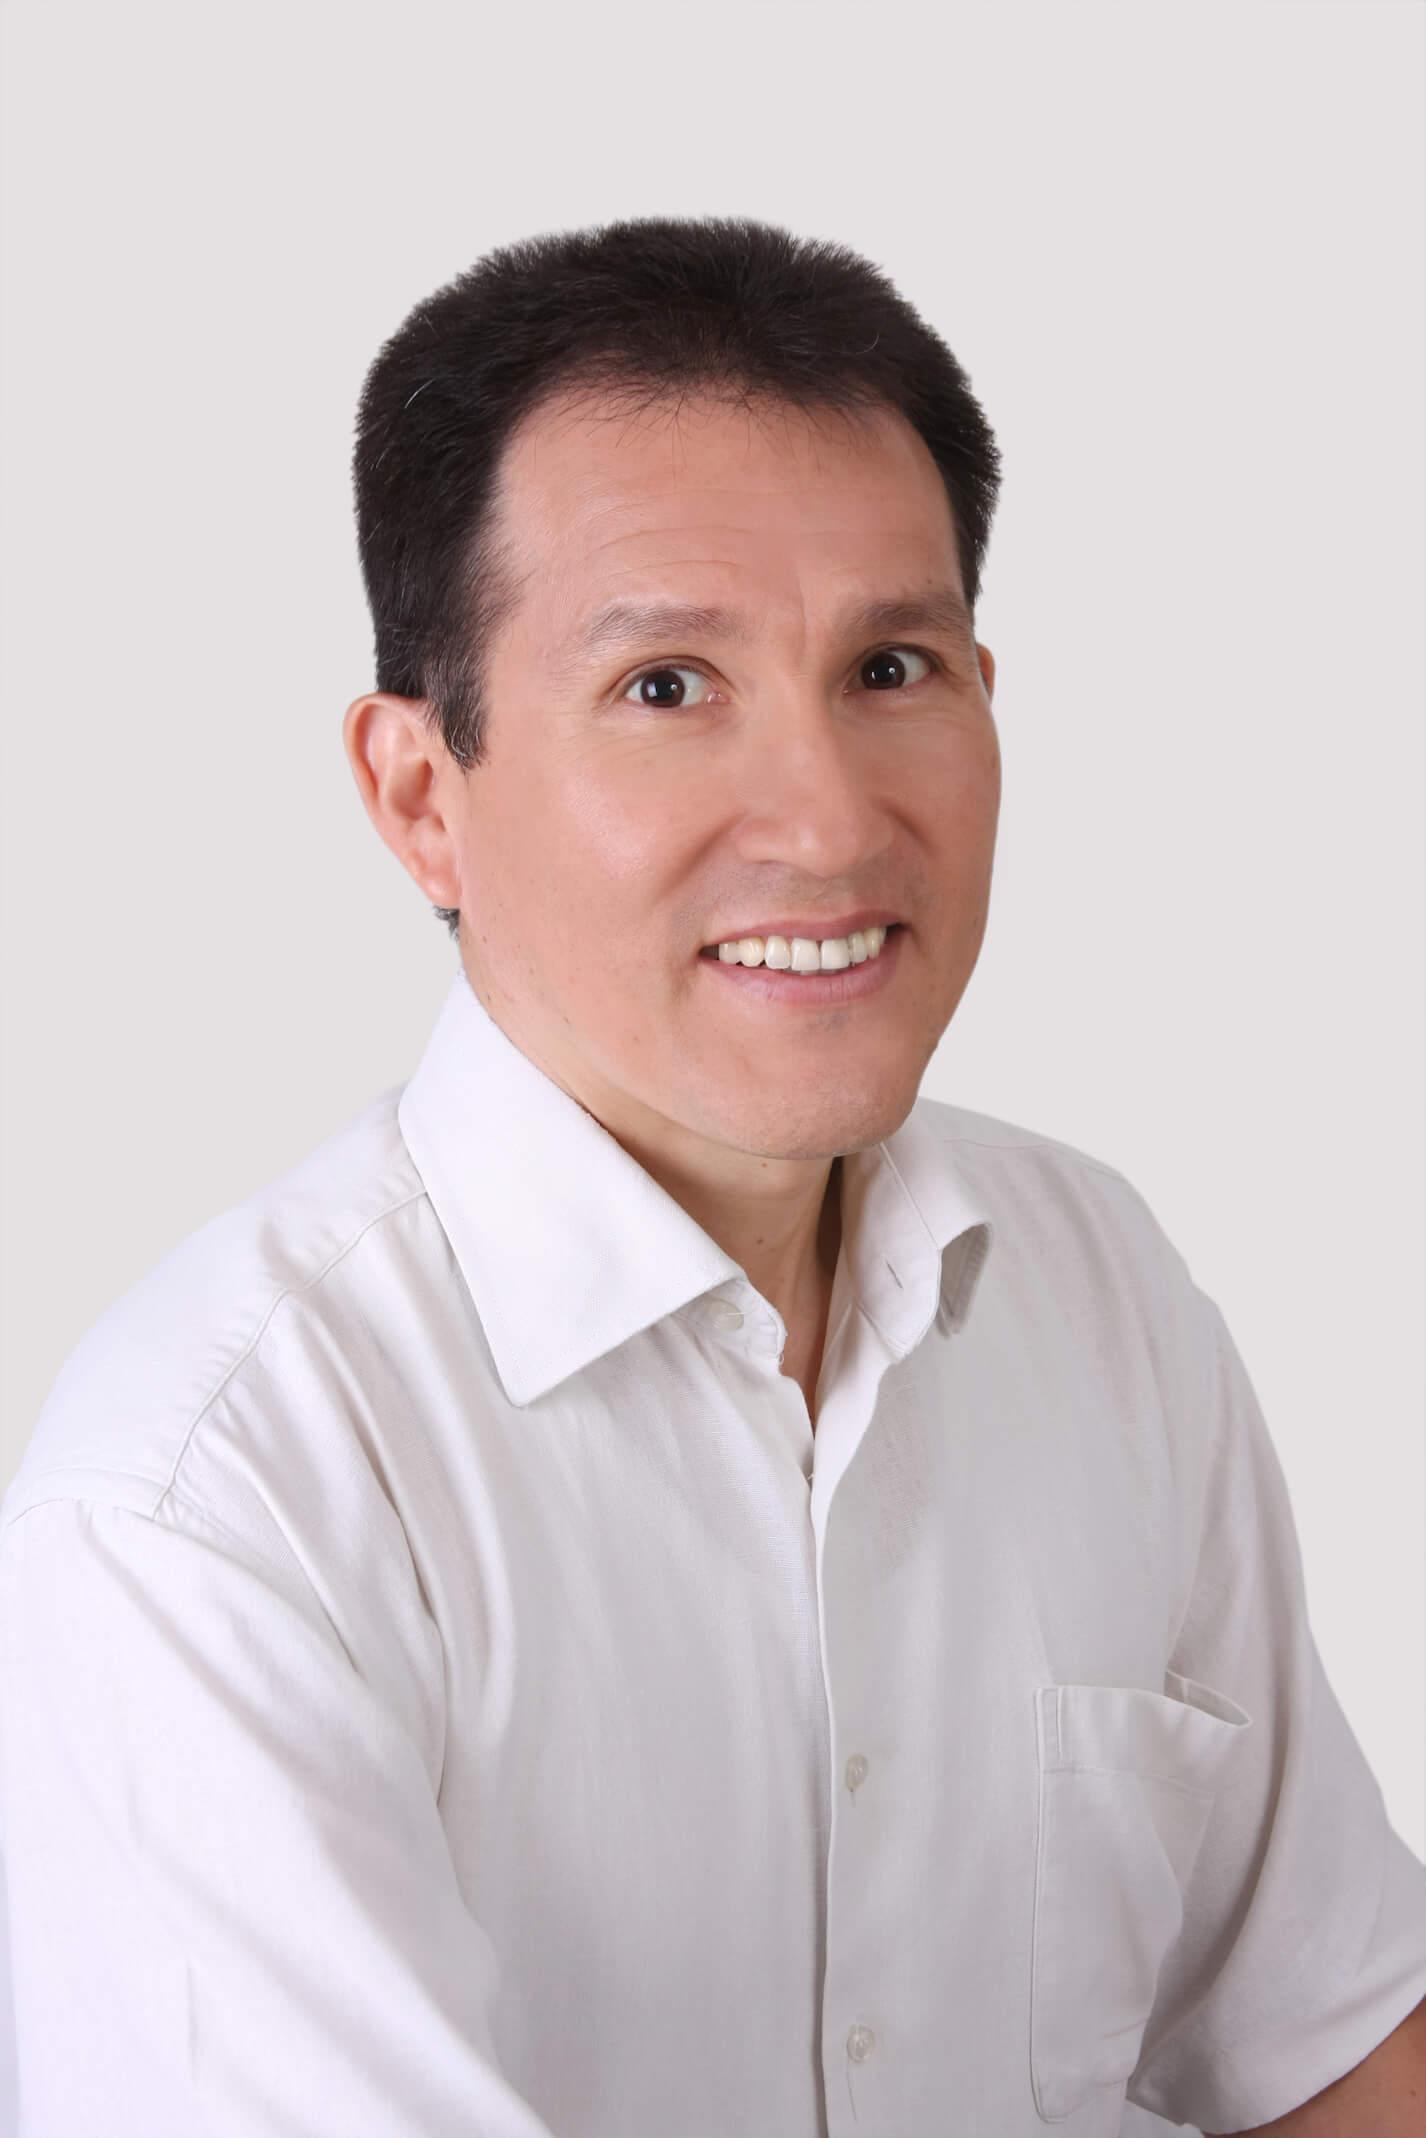 Jorge Cieza de León